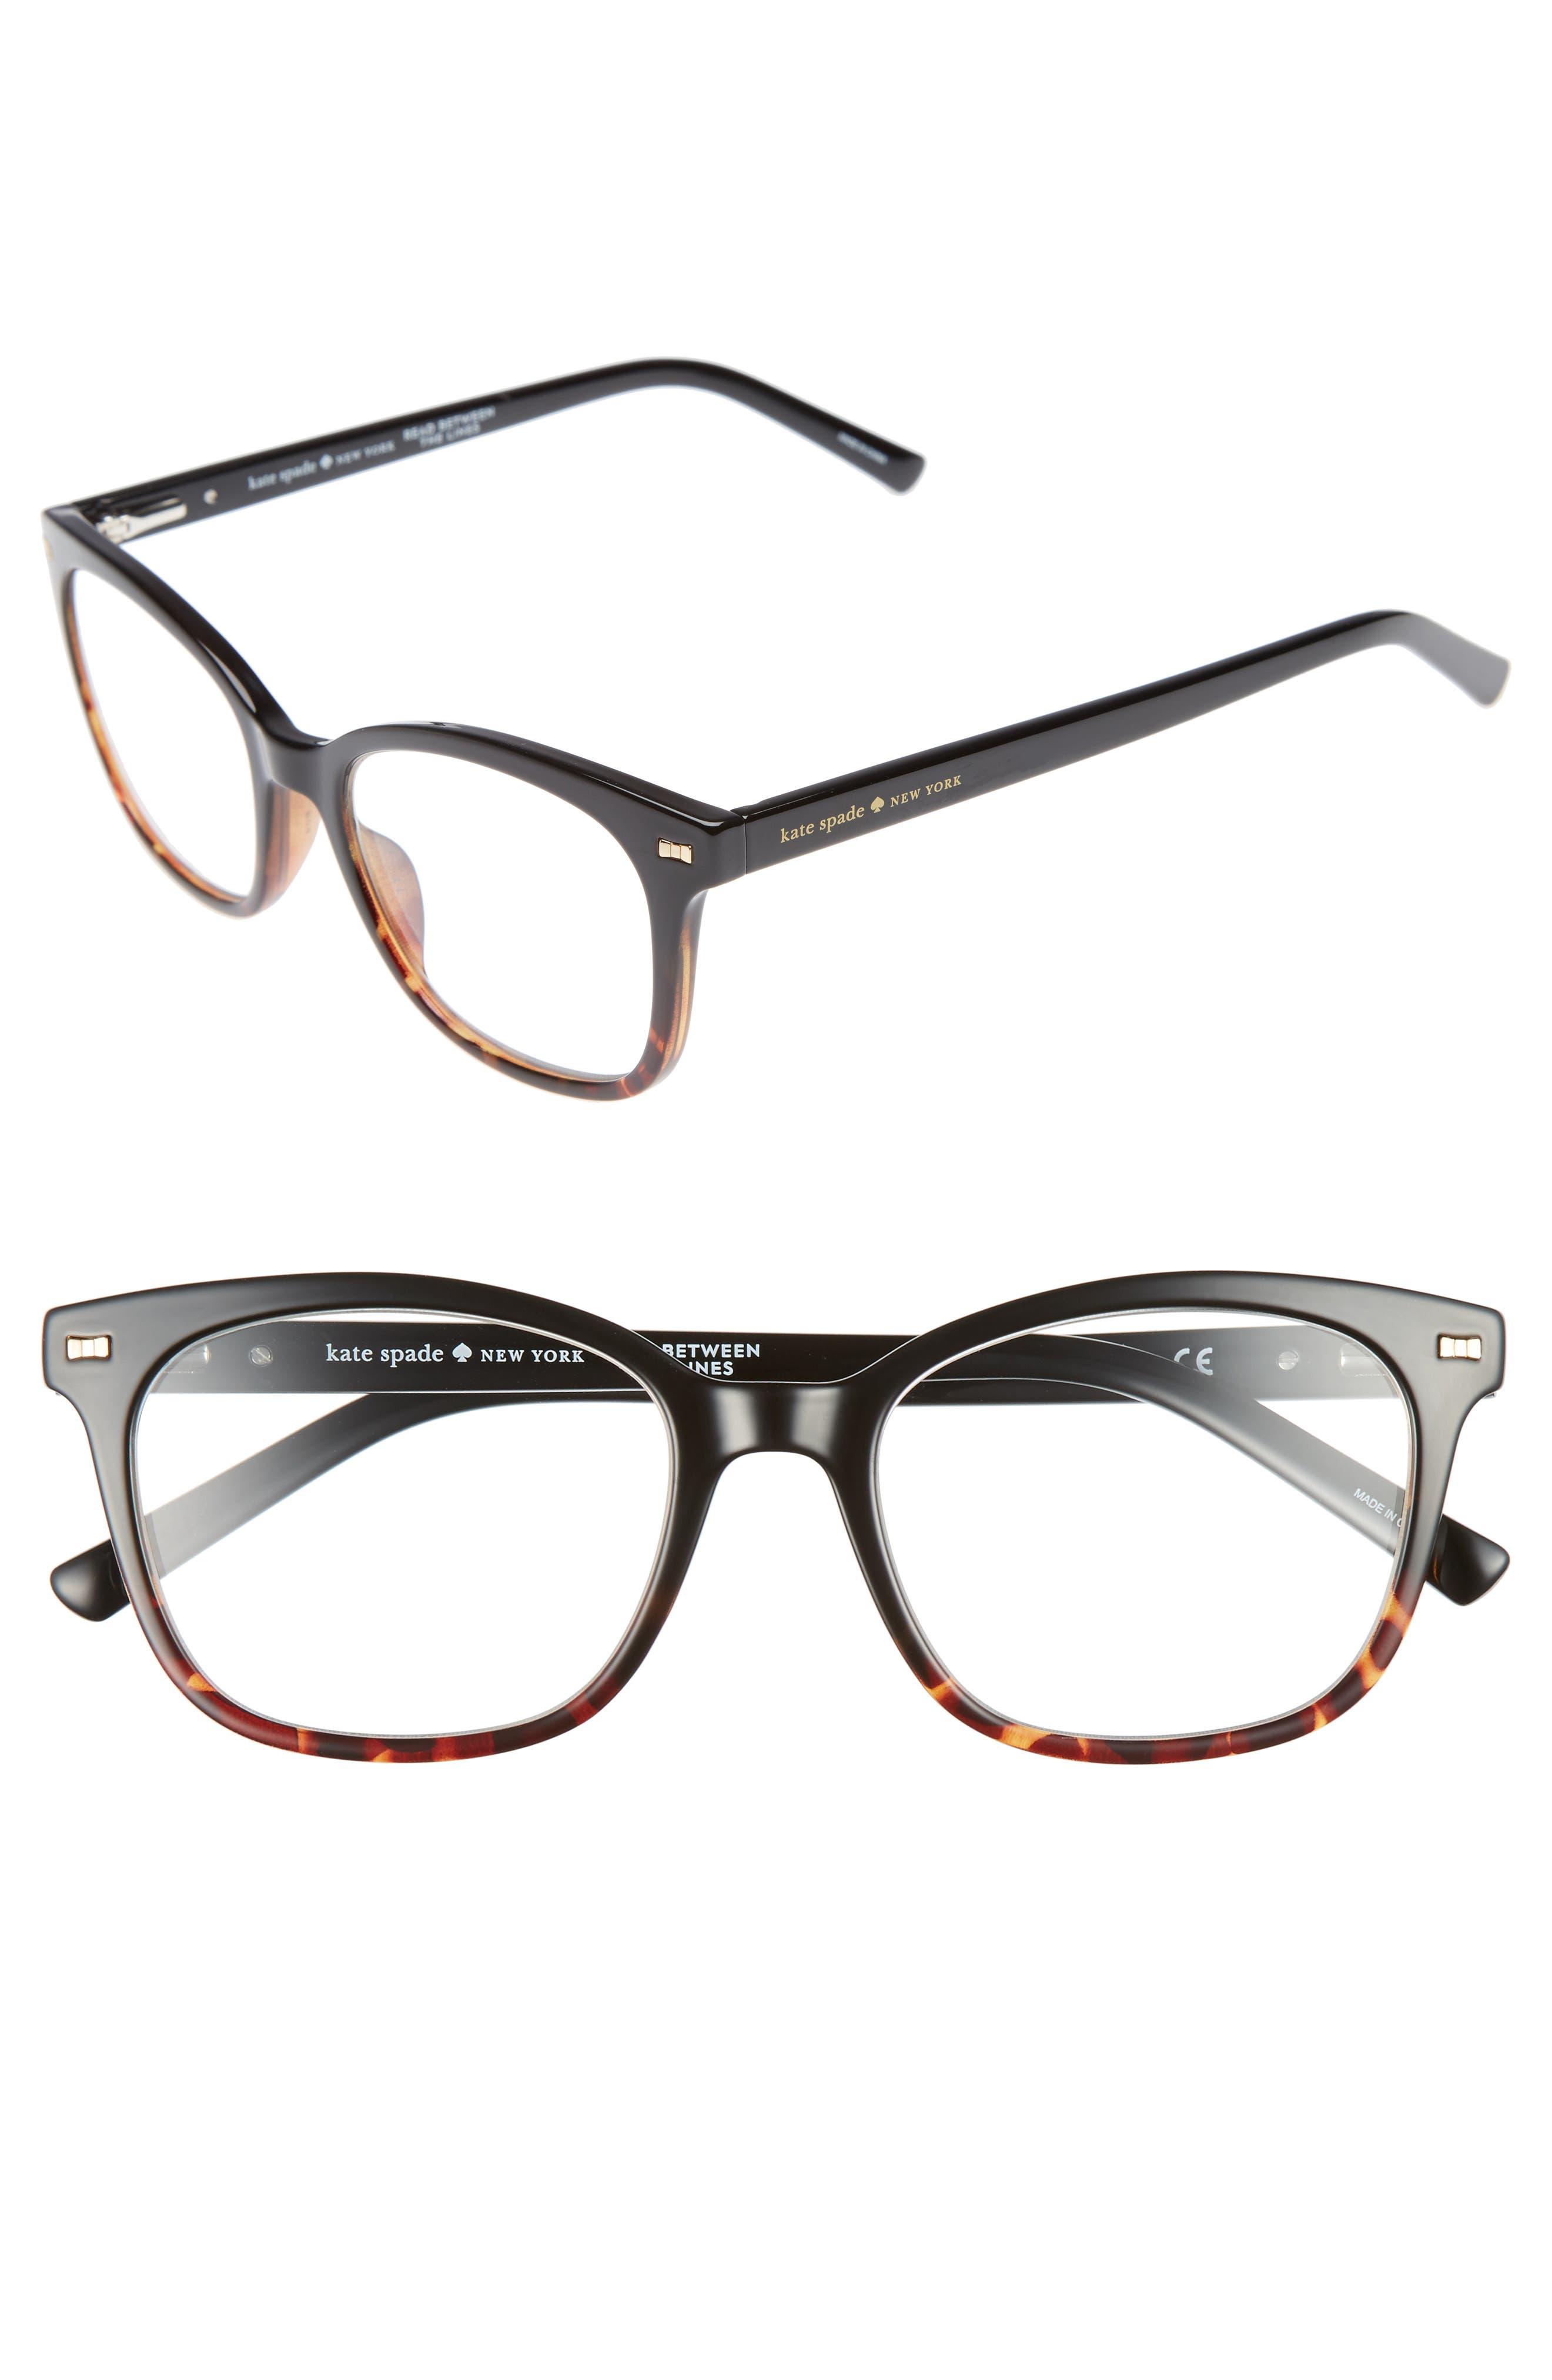 York Women Nordstrom New For Sunglasses Kate Spade Tw8UxOTH